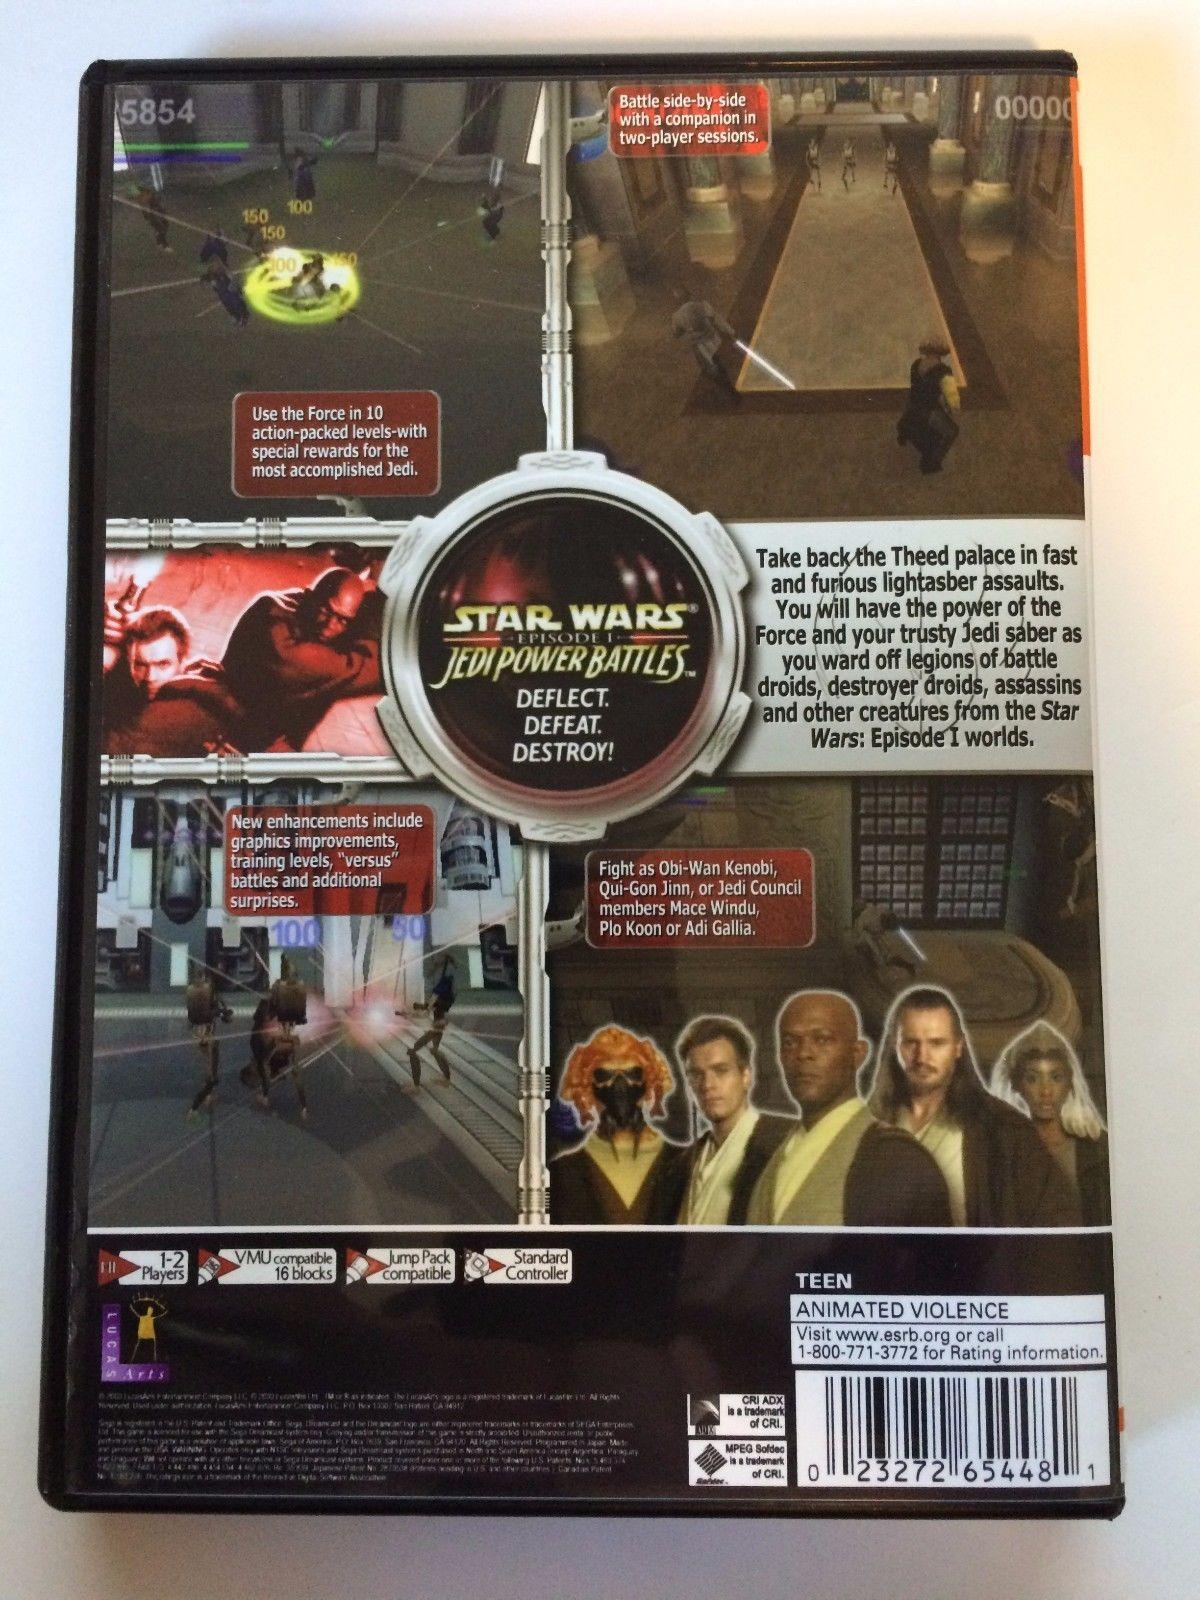 Star Wars Jedi Power Battles - Sega Dreamcast - Replacement Case - No Game